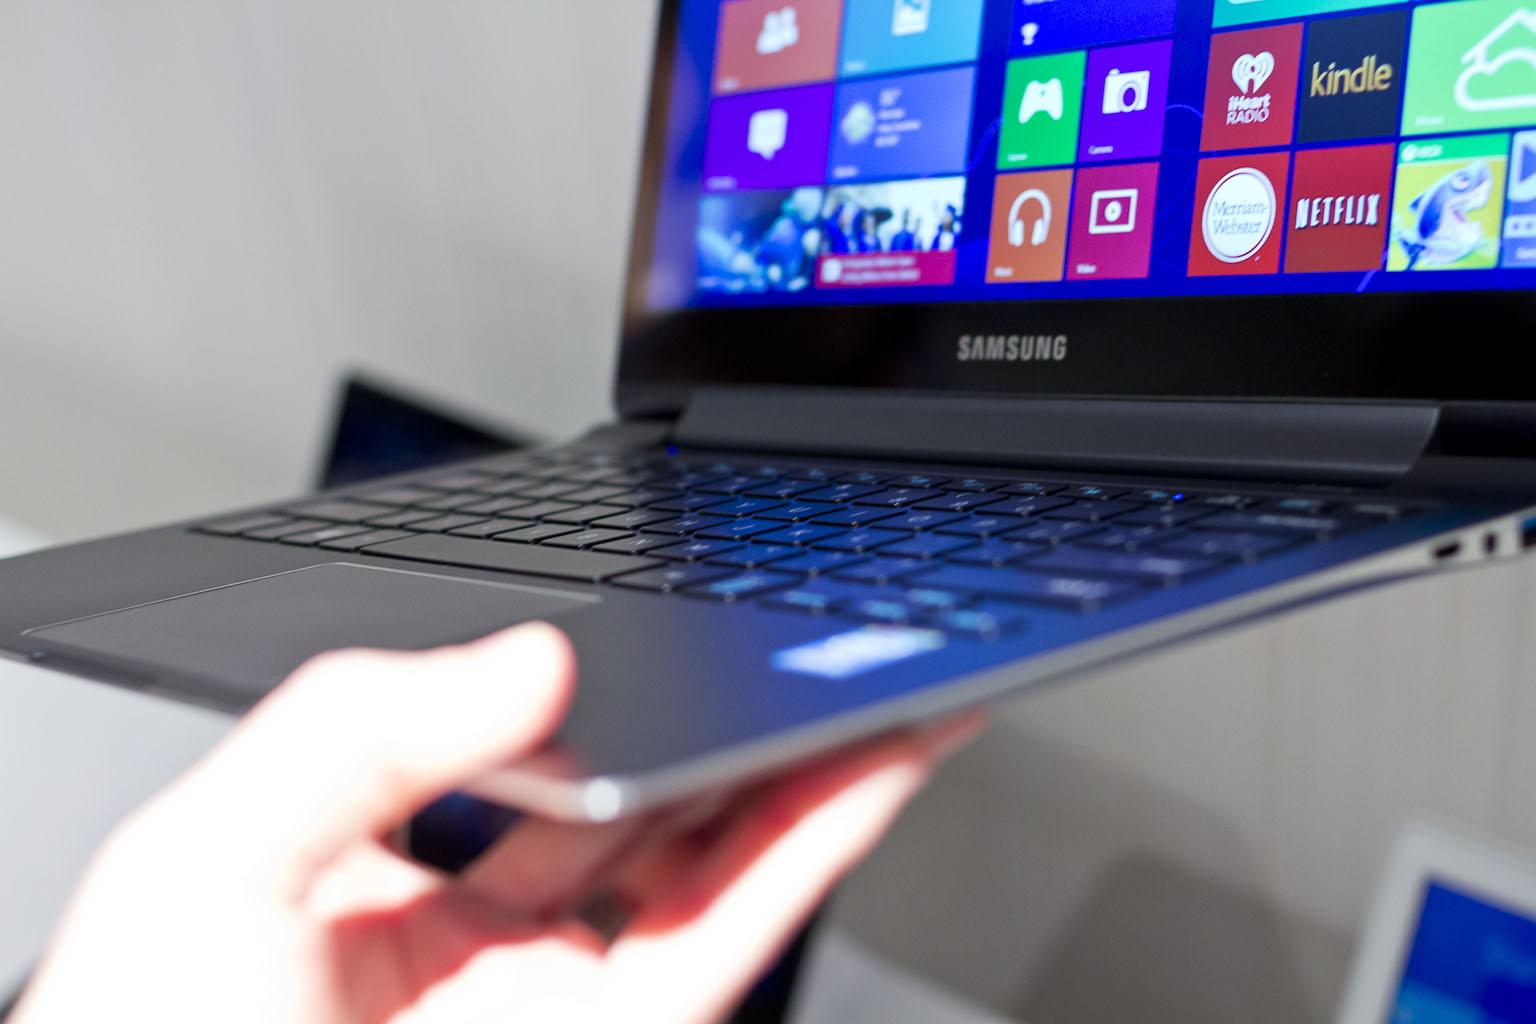 Samsung_Ativ_Book_9_Plus_laptop